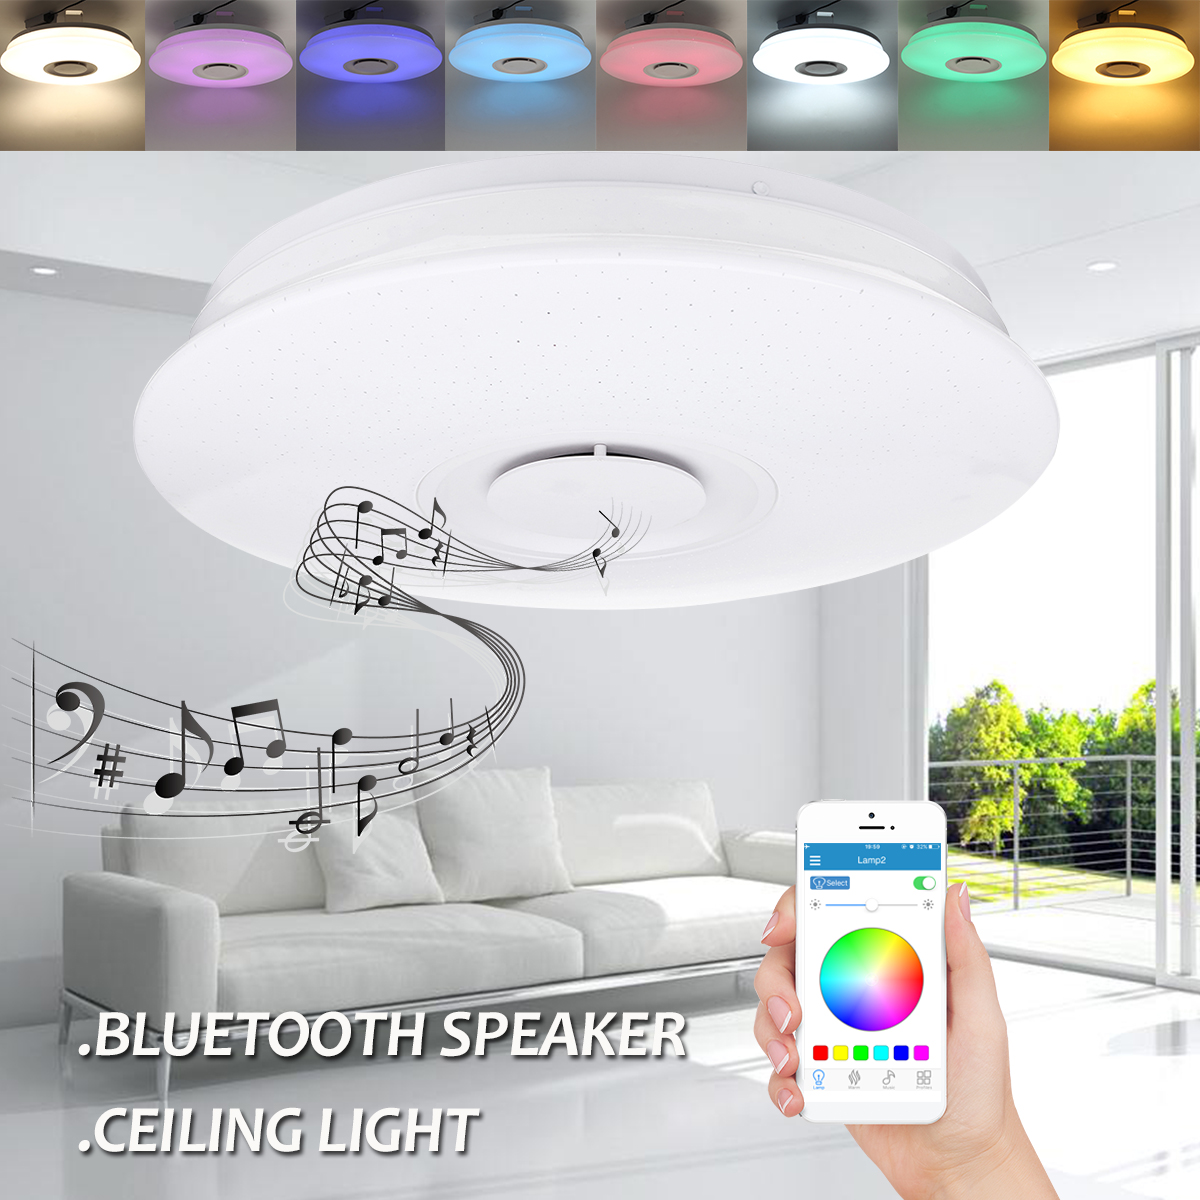 RGB LED Ceiling Light Bluetooth Speaker Music 36W Led Ceiling Lamp Smart APP Remote Control For Kids Bedroom Living Room Decor цена